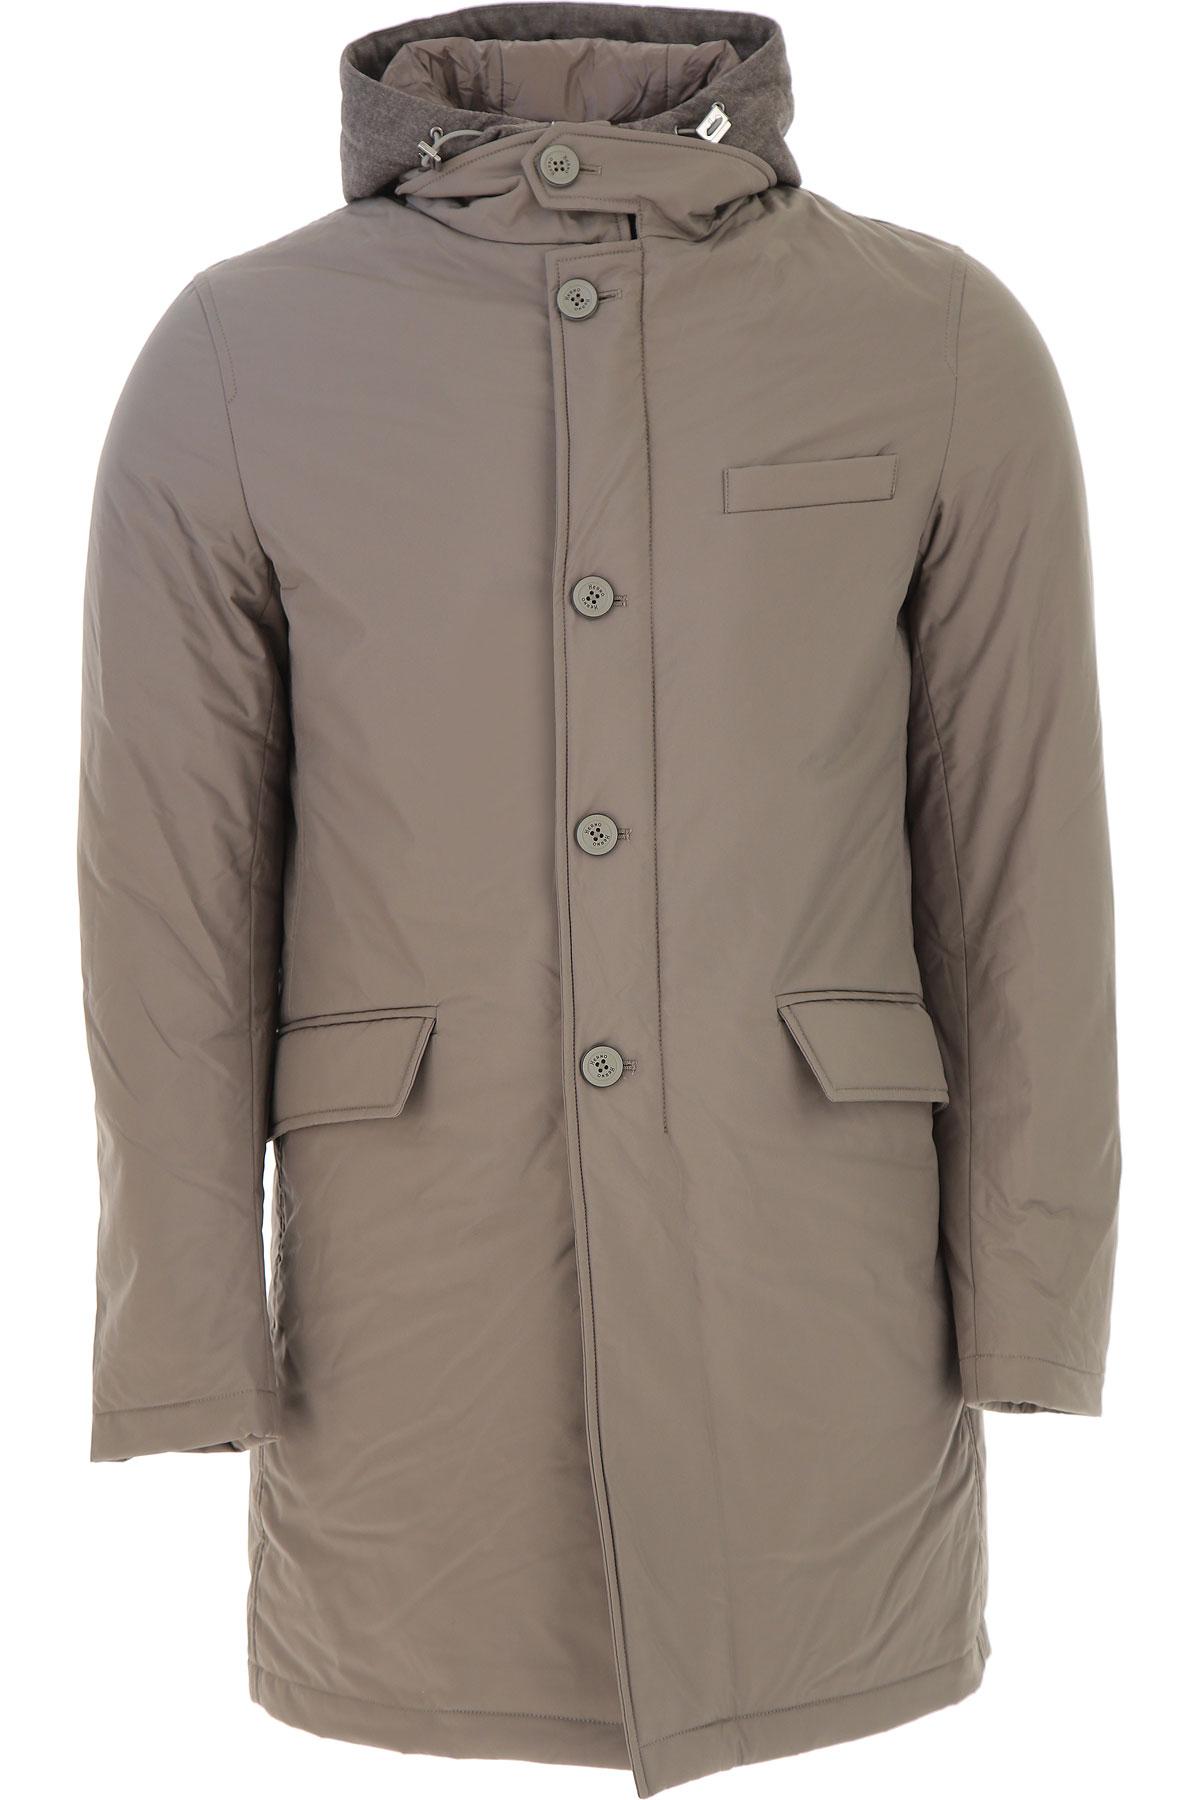 chaqueta de Herno Xl abajo abajo para M 2017 L esquí medio chaqueta gris Puffer hombres qwRIRrZA